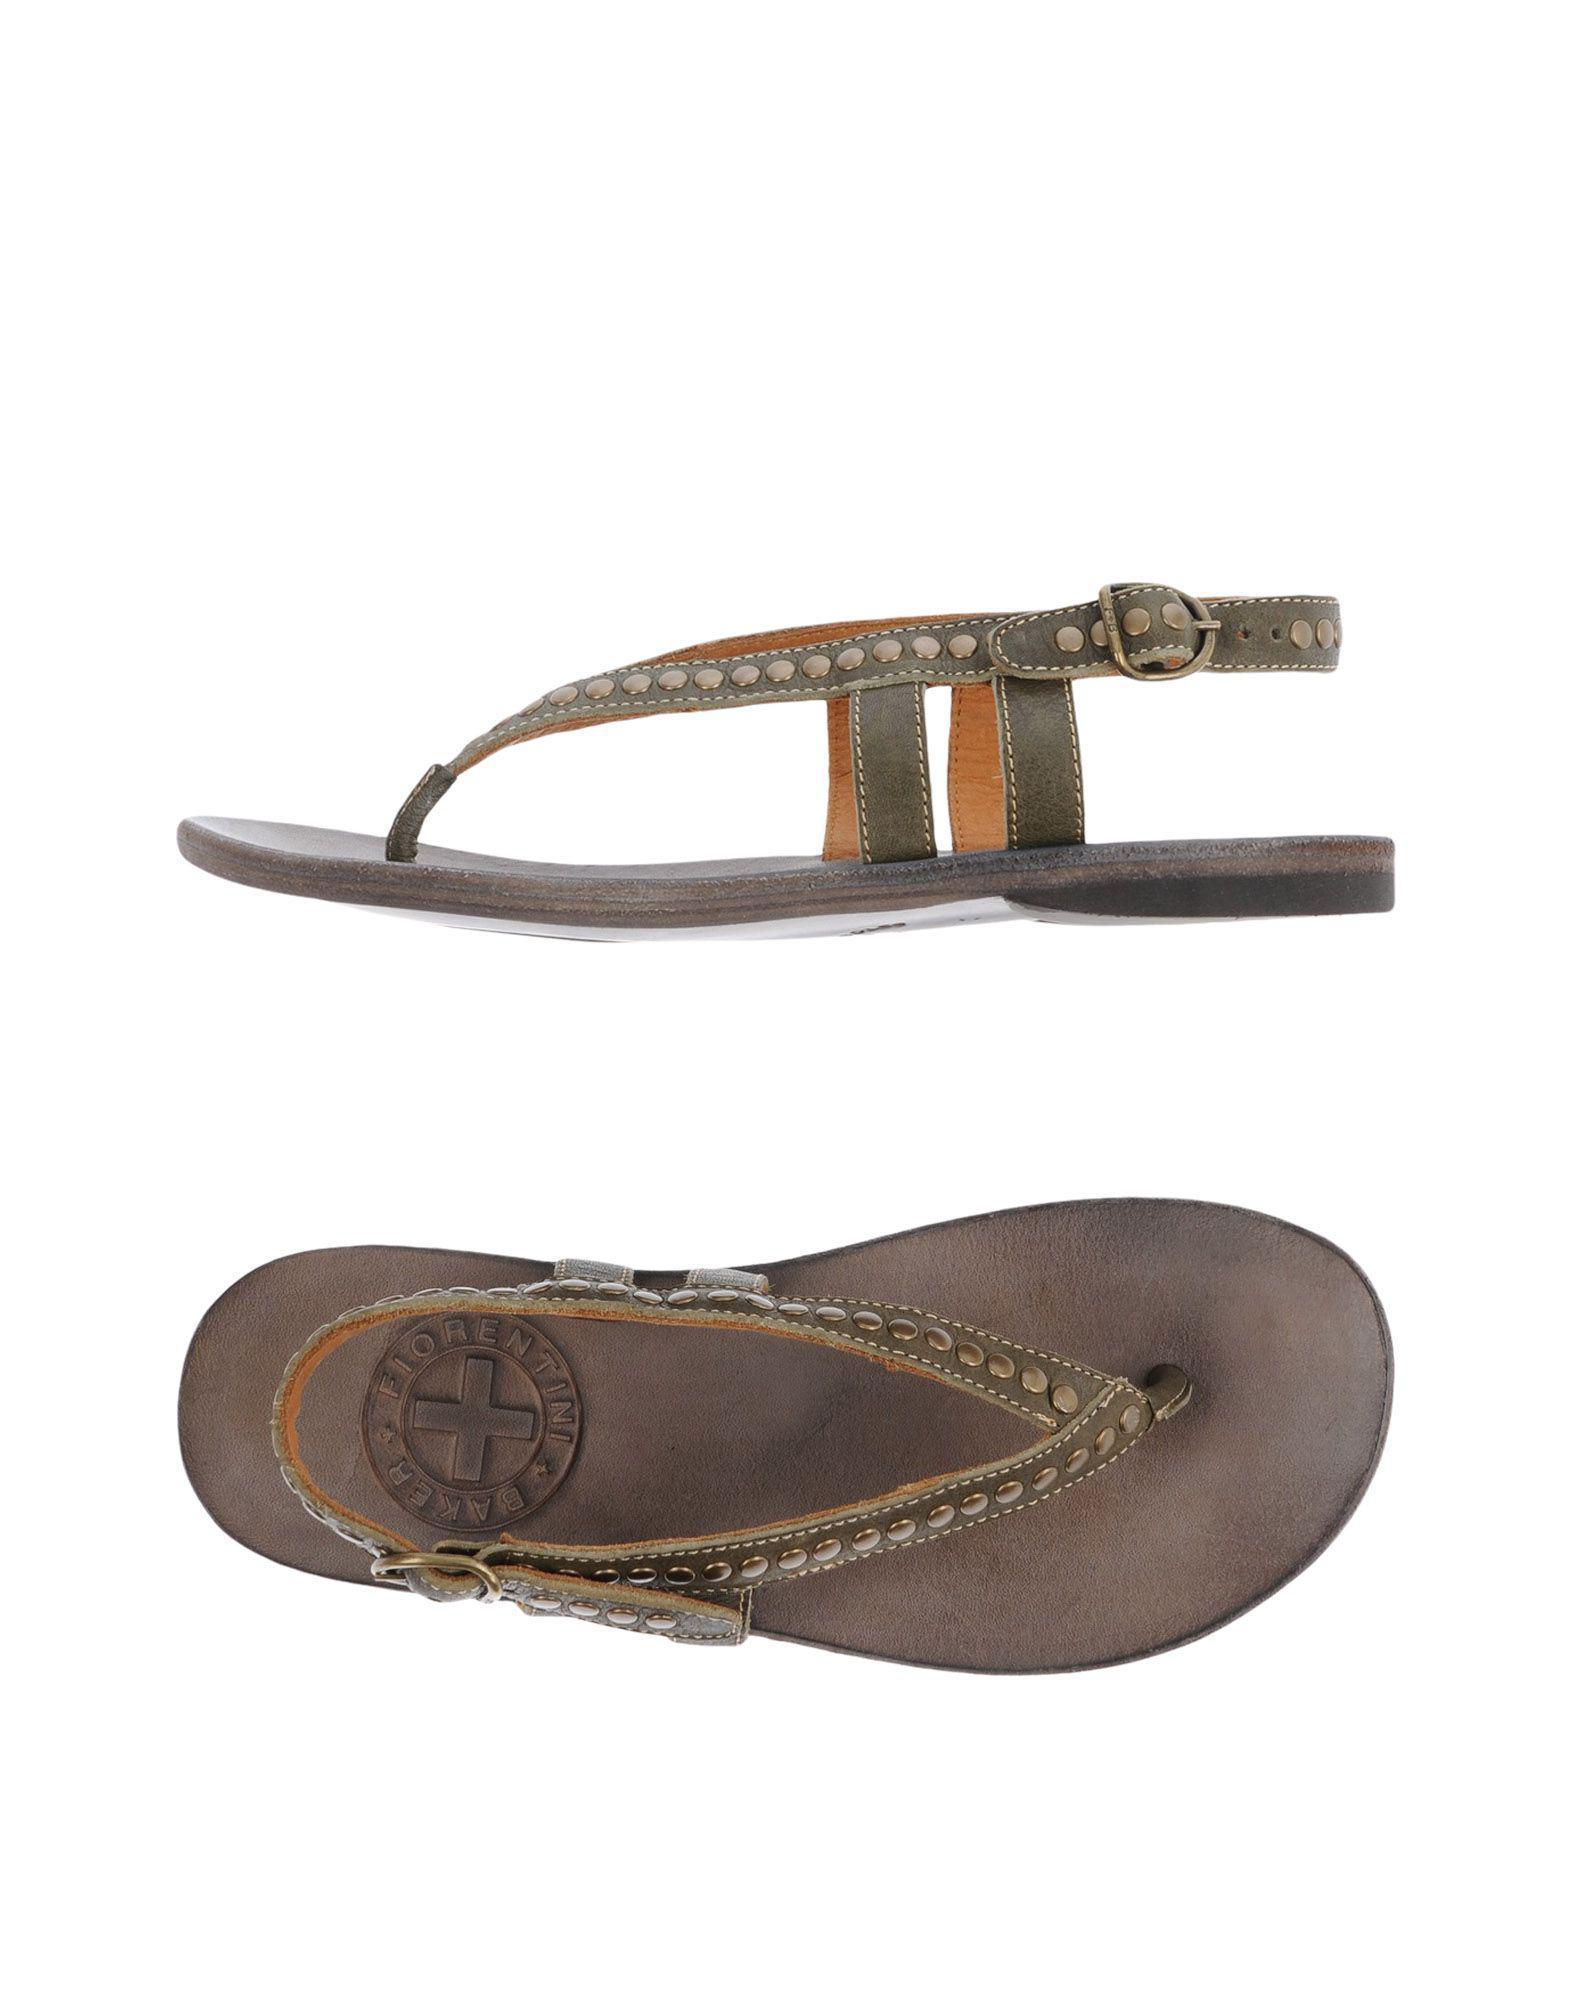 FOOTWEAR - Toe post sandals Fiorentini + Baker En7Kv